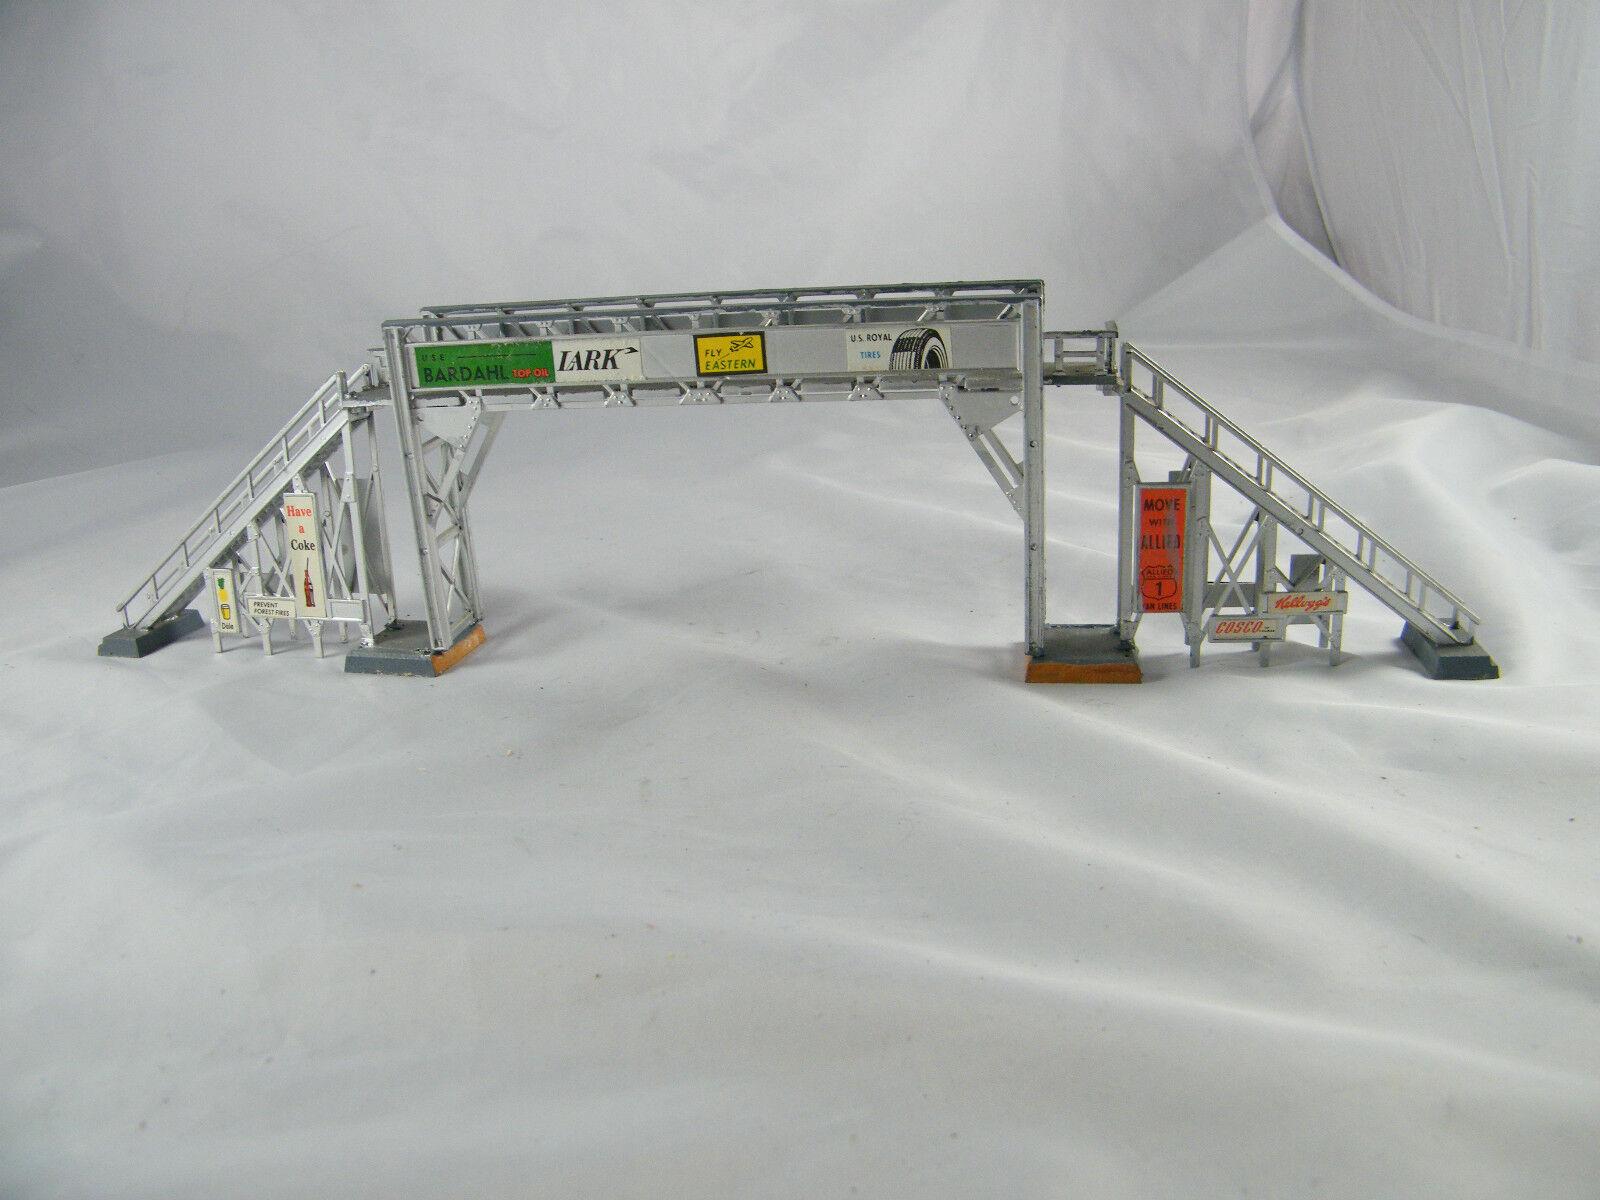 Jahr  HO SCALE  PASSENGER BRIDGE WITH ADGrünISING  COKE LARK BARDAHL ETC..